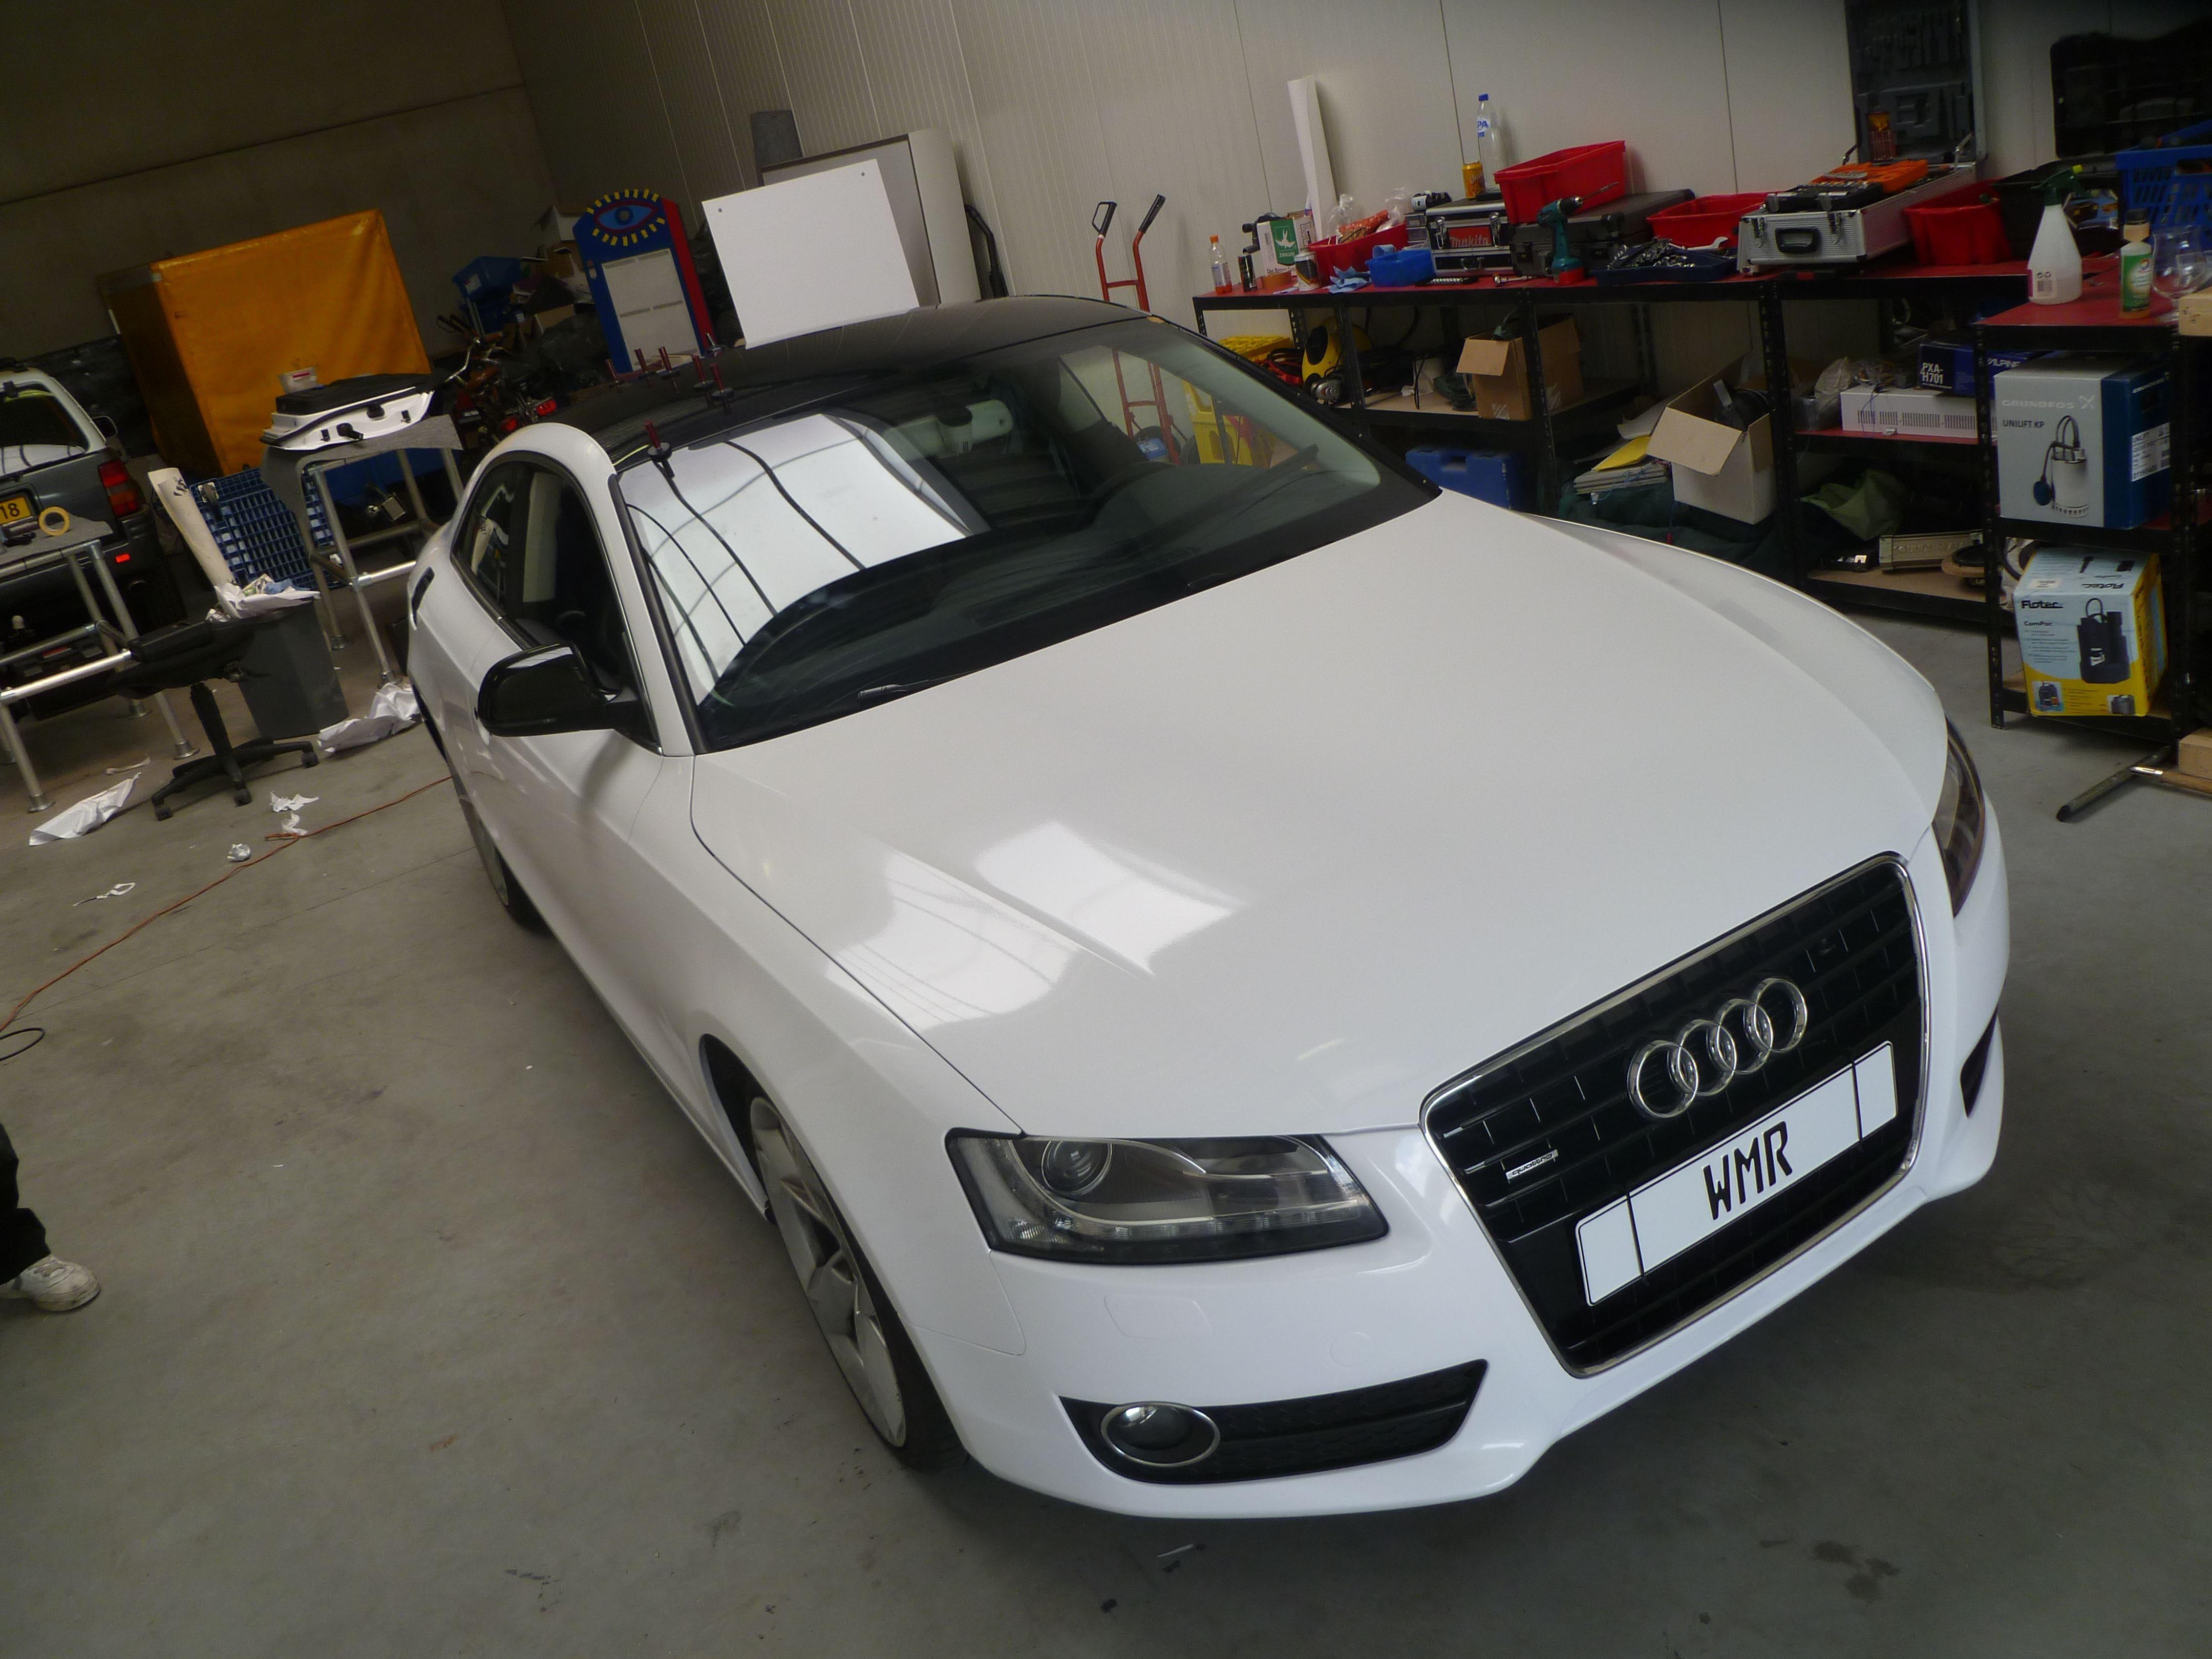 Audi A5 coupe met Metallic Witte Wrap, Carwrapping door Wrapmyride.nu Foto-nr:4726, ©2021